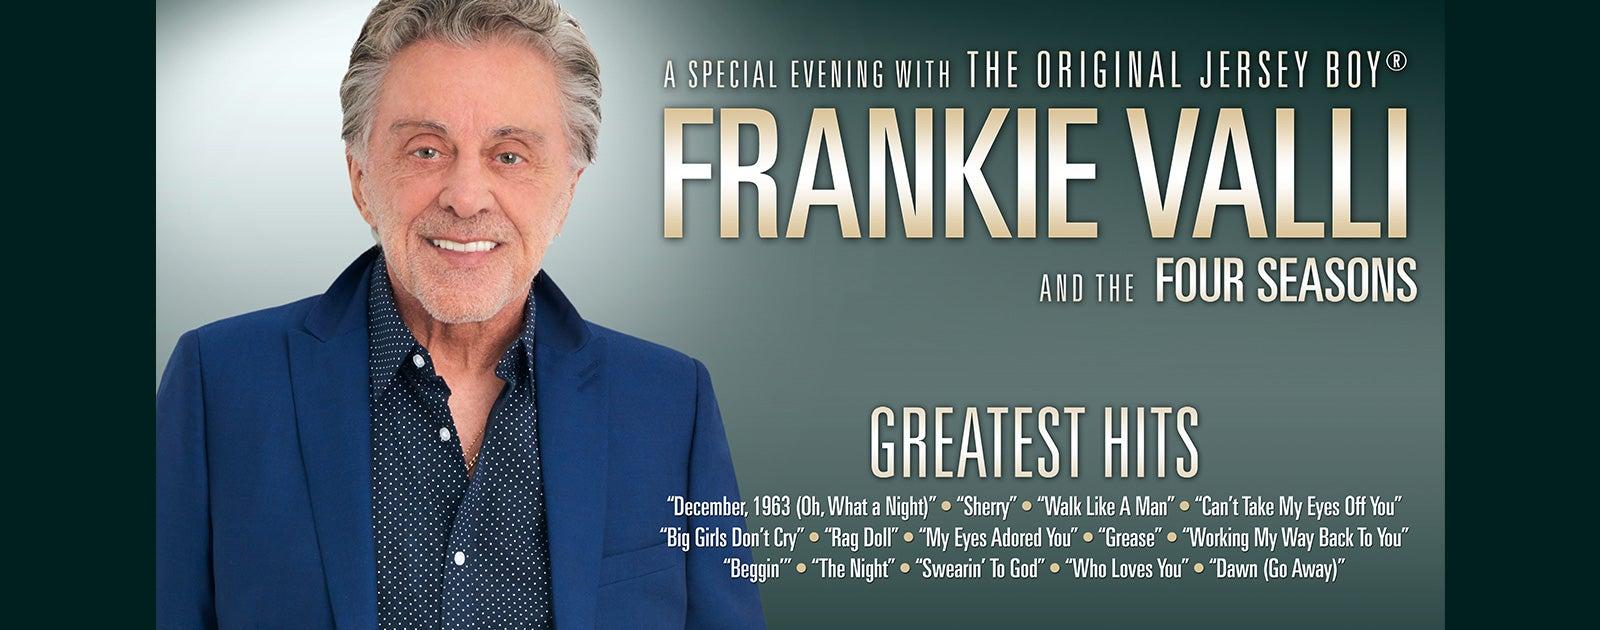 Frankie Valli & The Four Seasons - RESCHEDULED